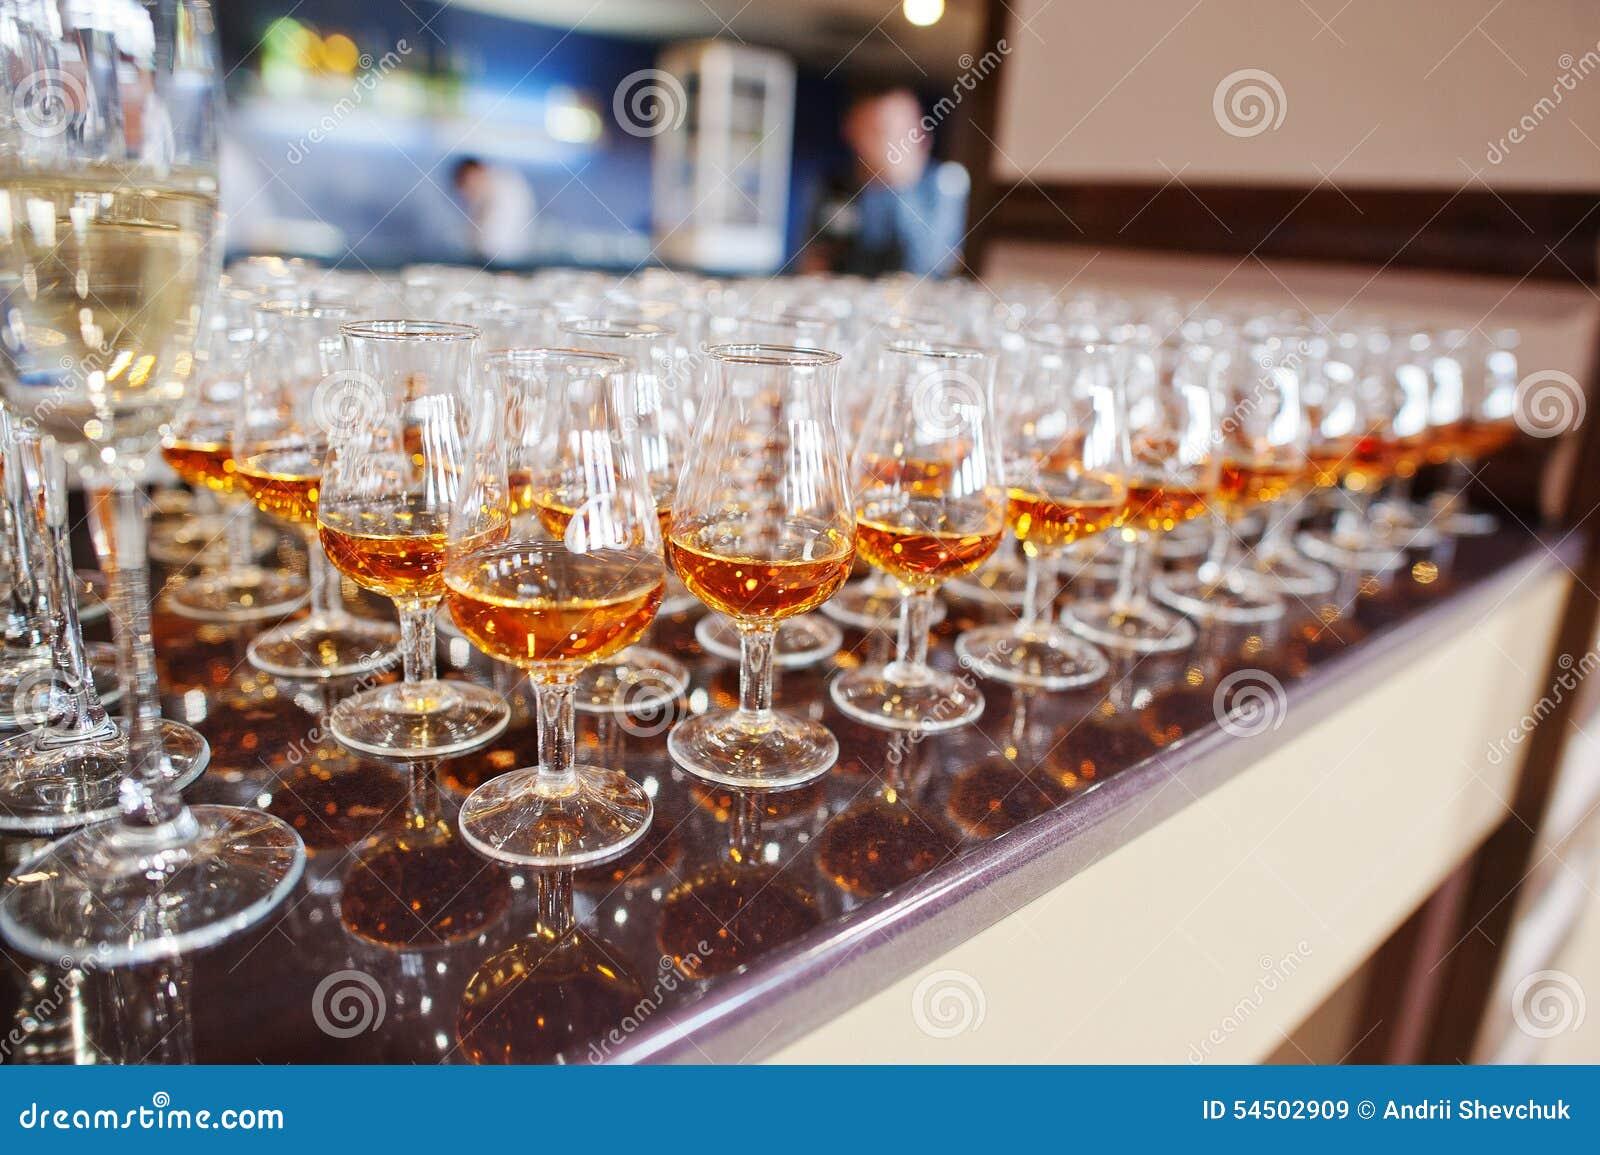 Vin, champagne, verres de cognac